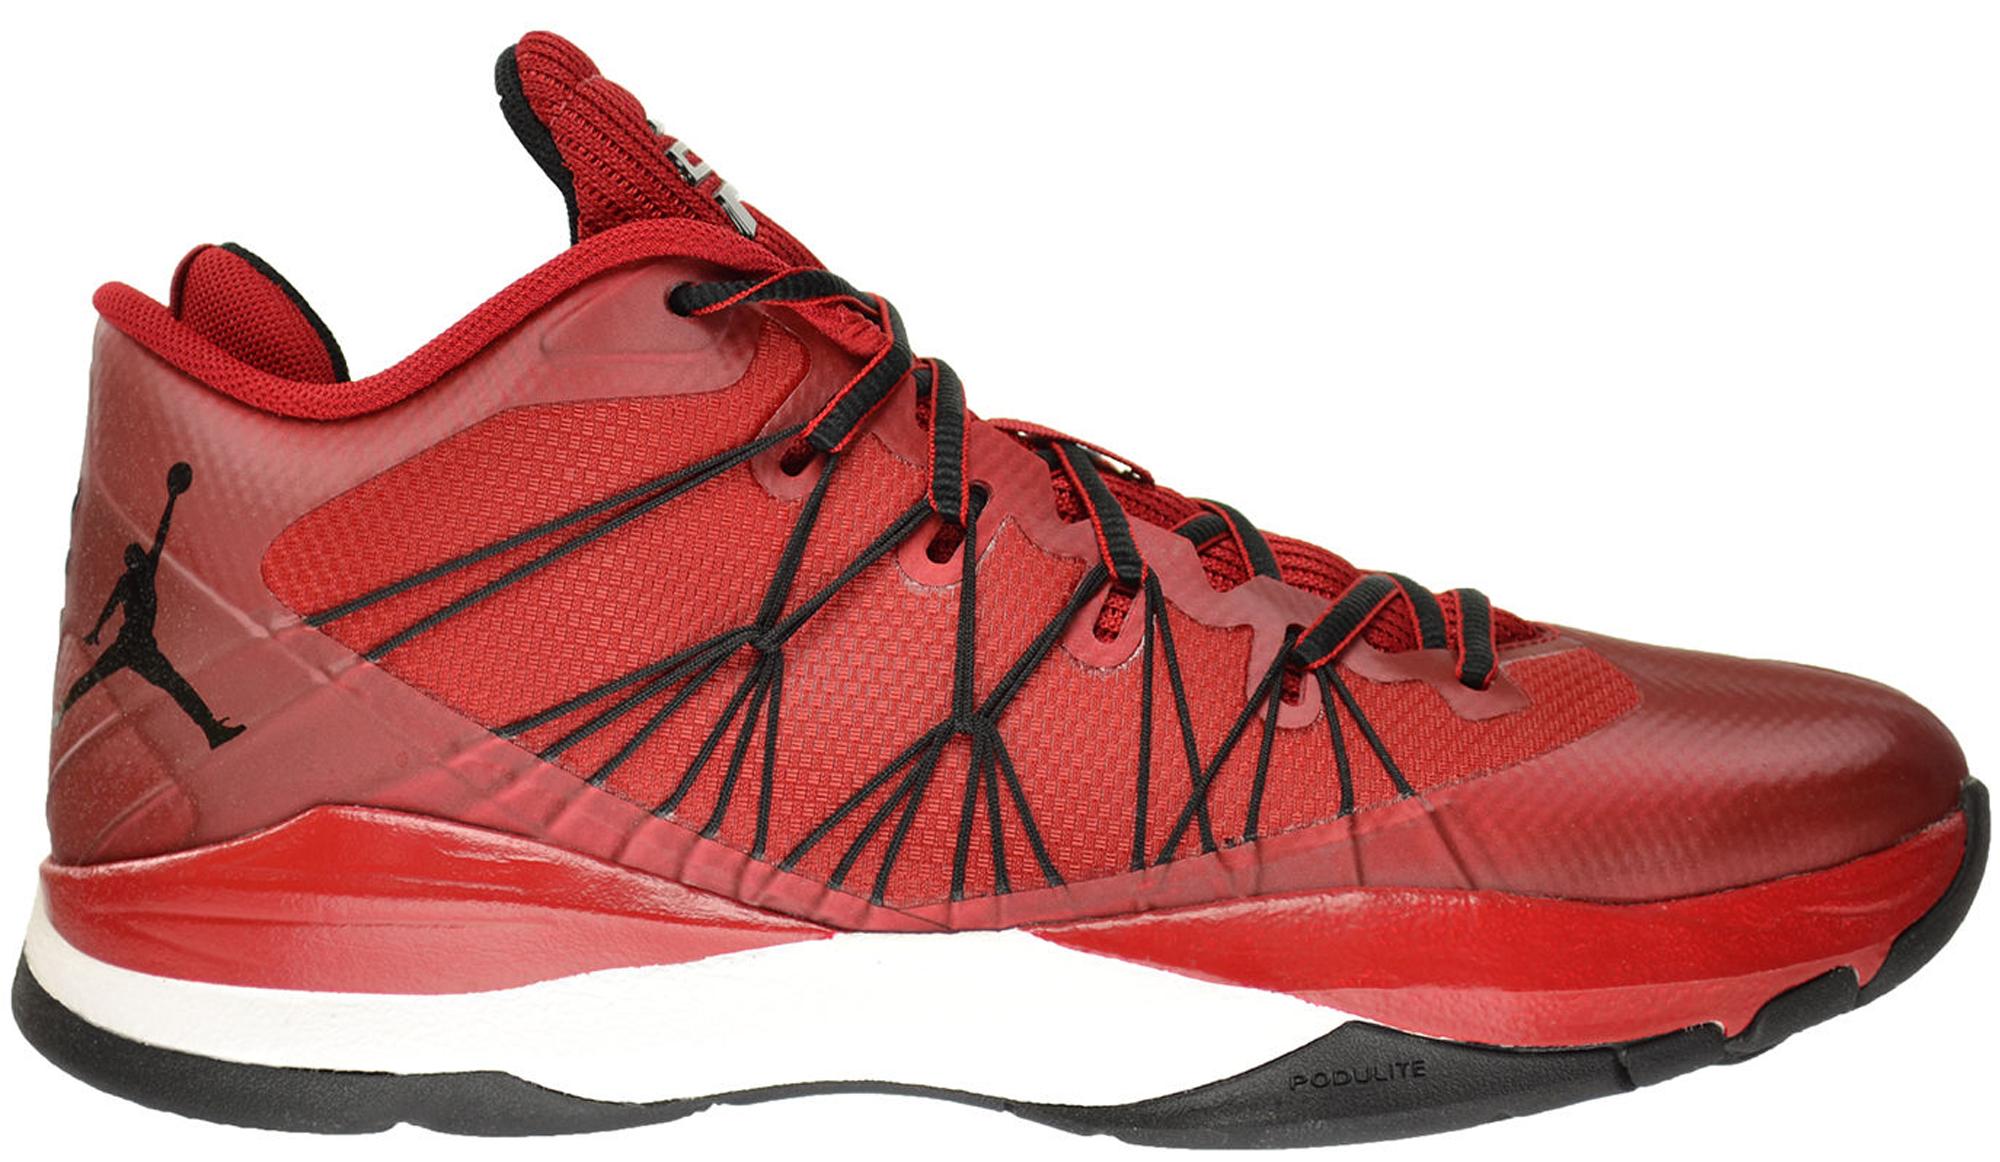 Jordan CP3.VII AE Gym Red Black